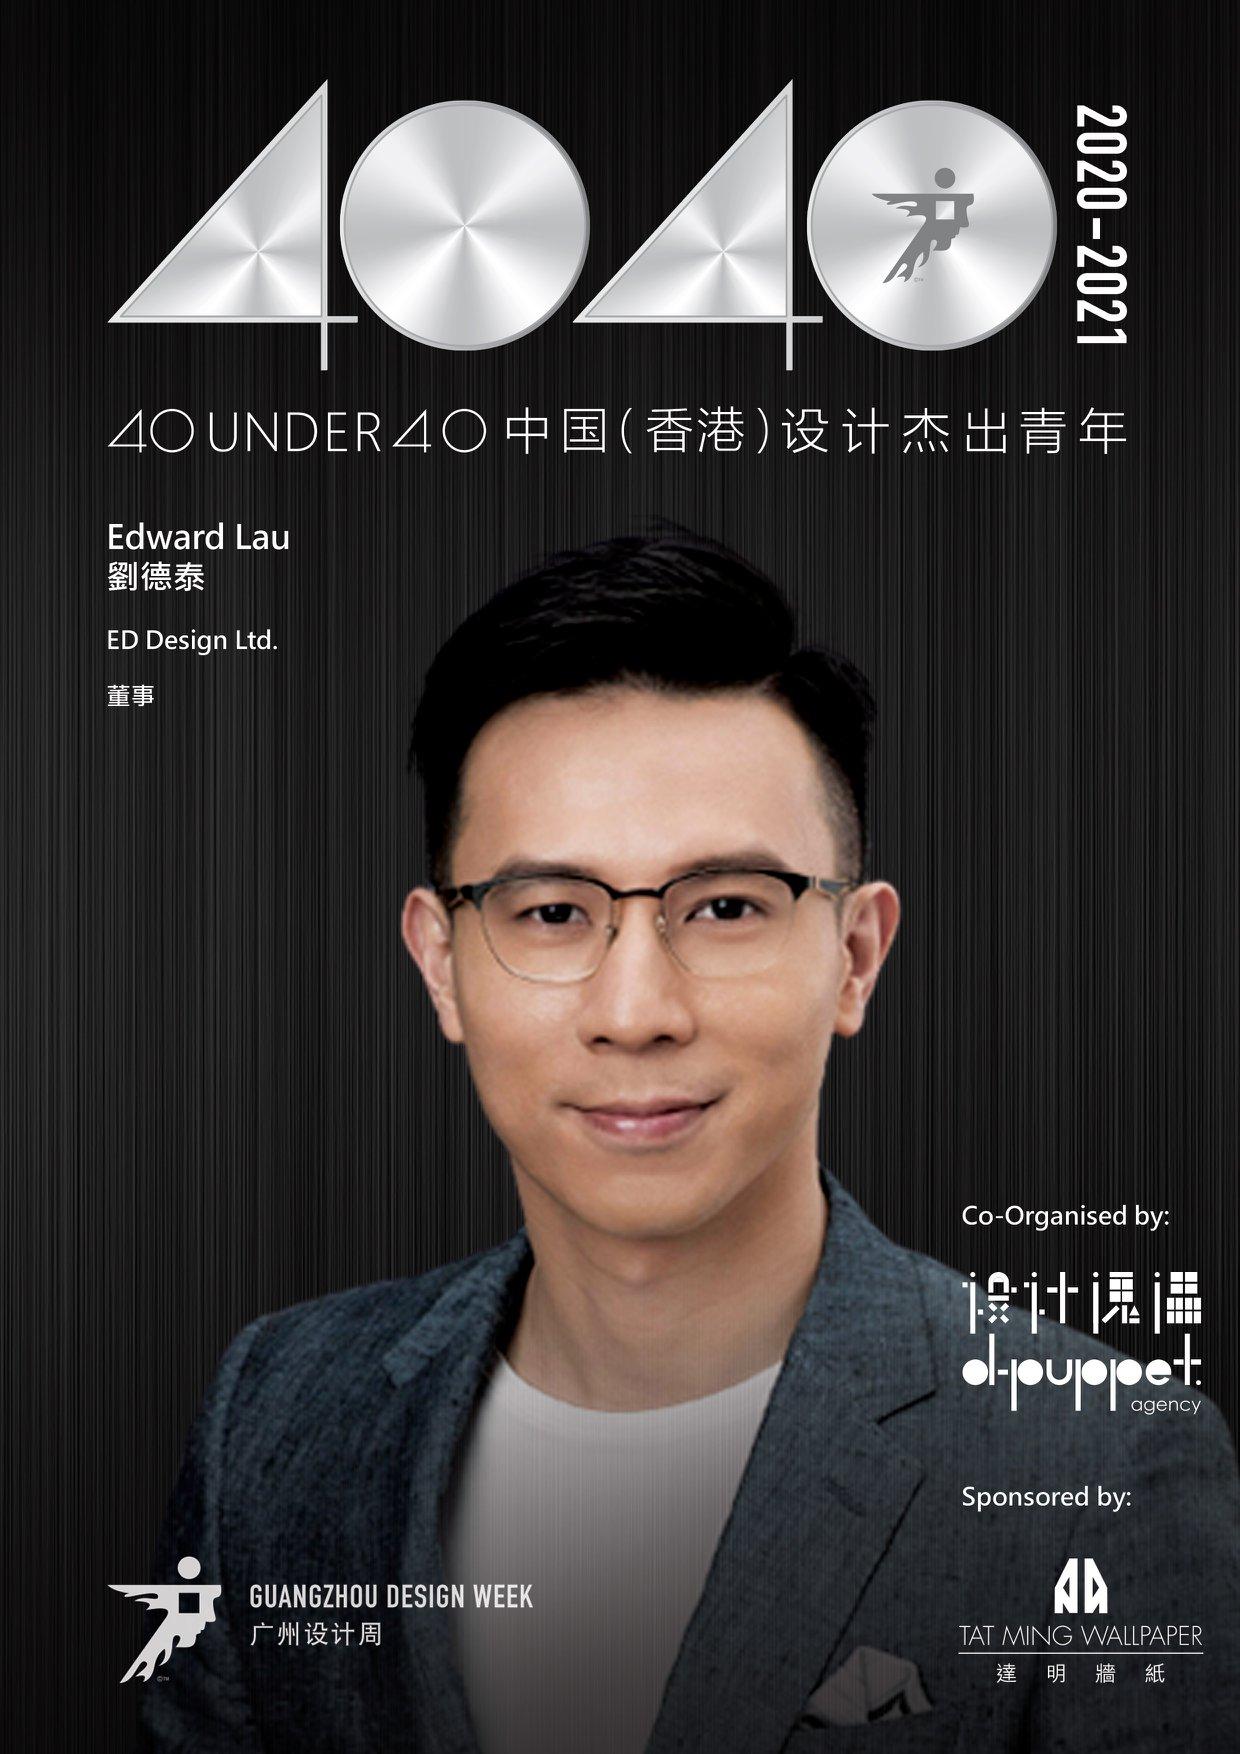 21 Edward荣获2020-2021届40 under 40中国(香港)设计杰出青年.jpg